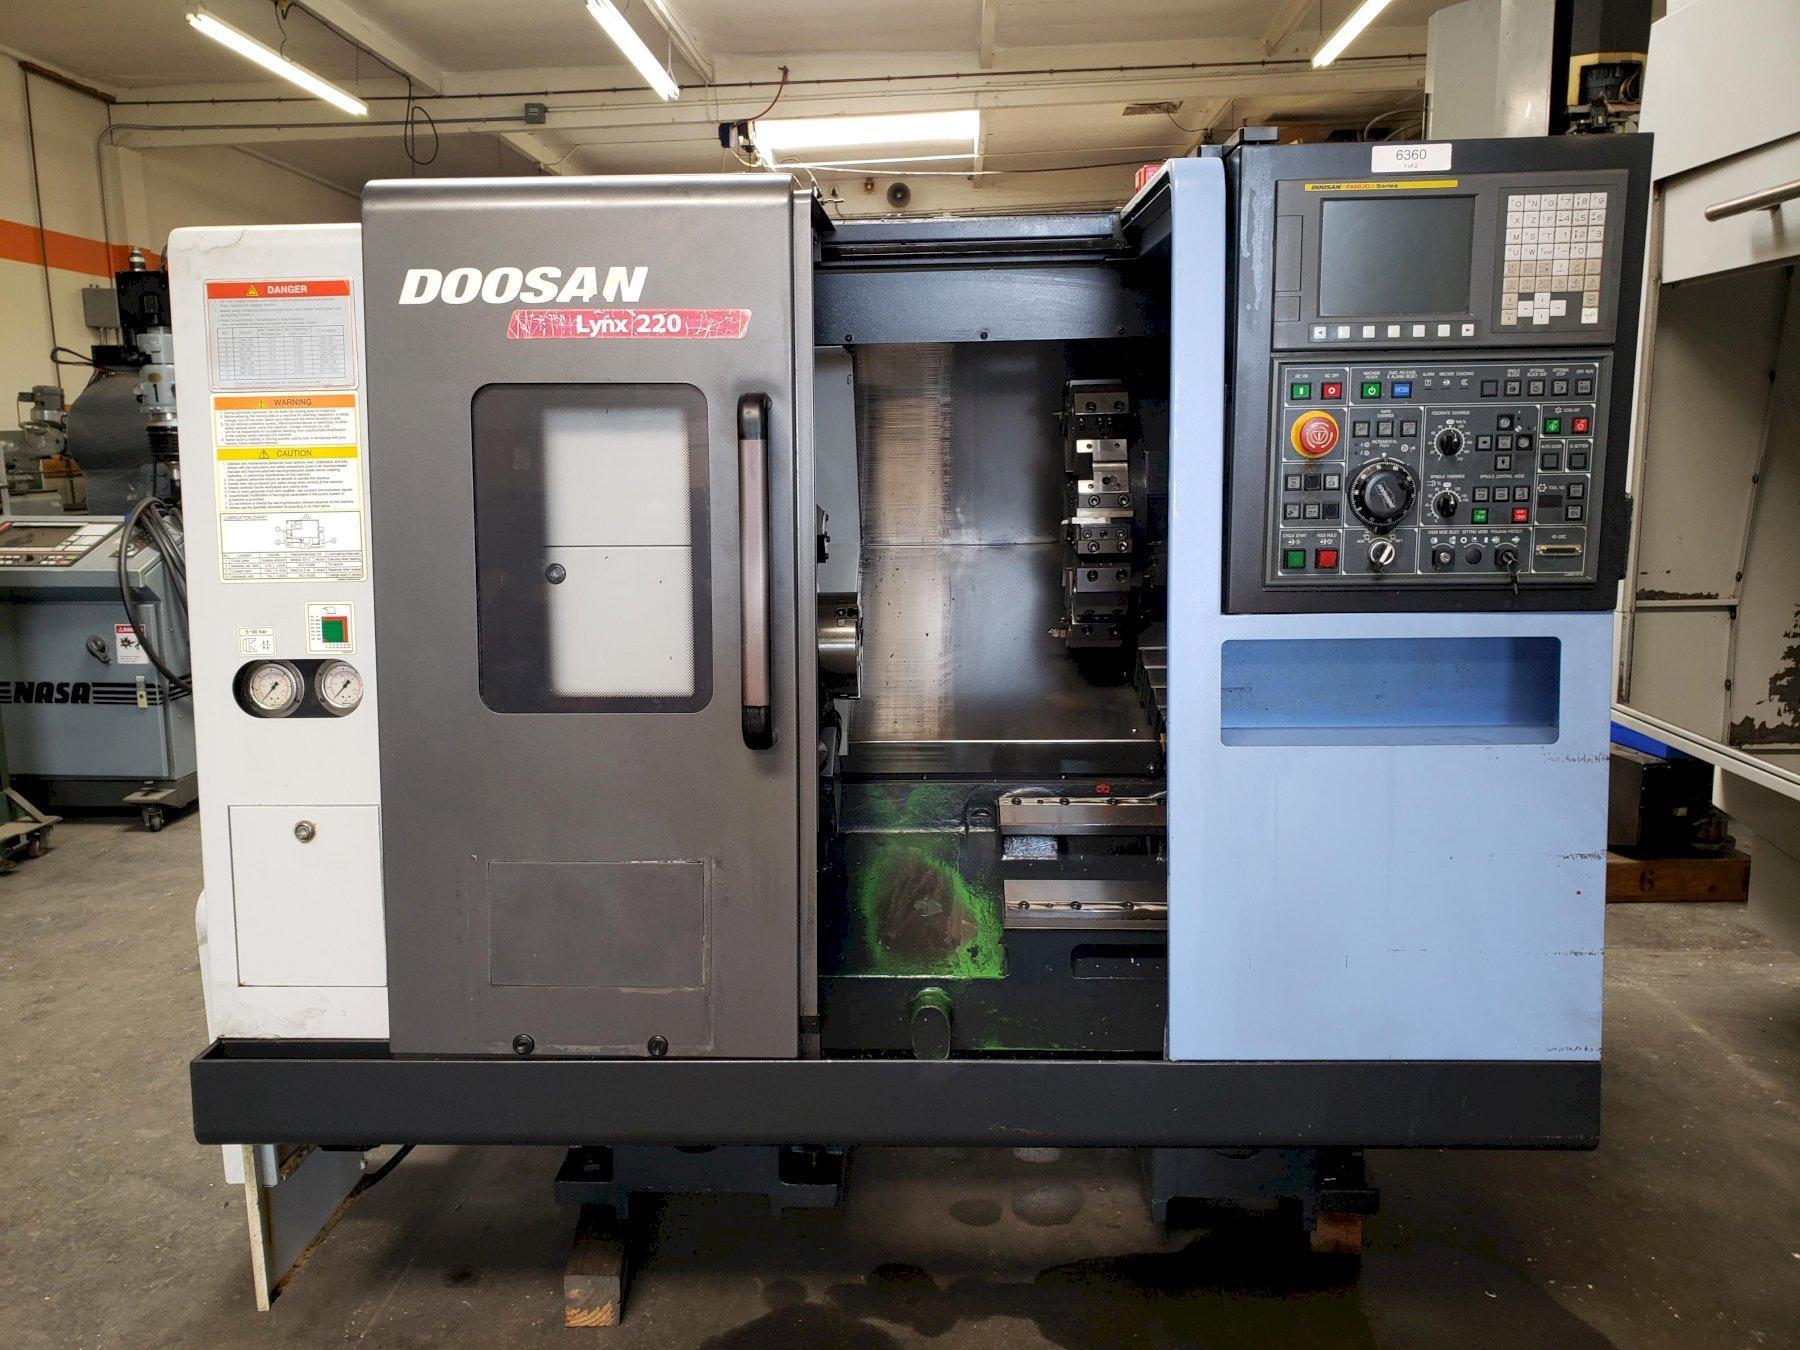 Doosan Lynx 220A CNC Lathe 2014 with: Fanuc i Series CNC Control, 6